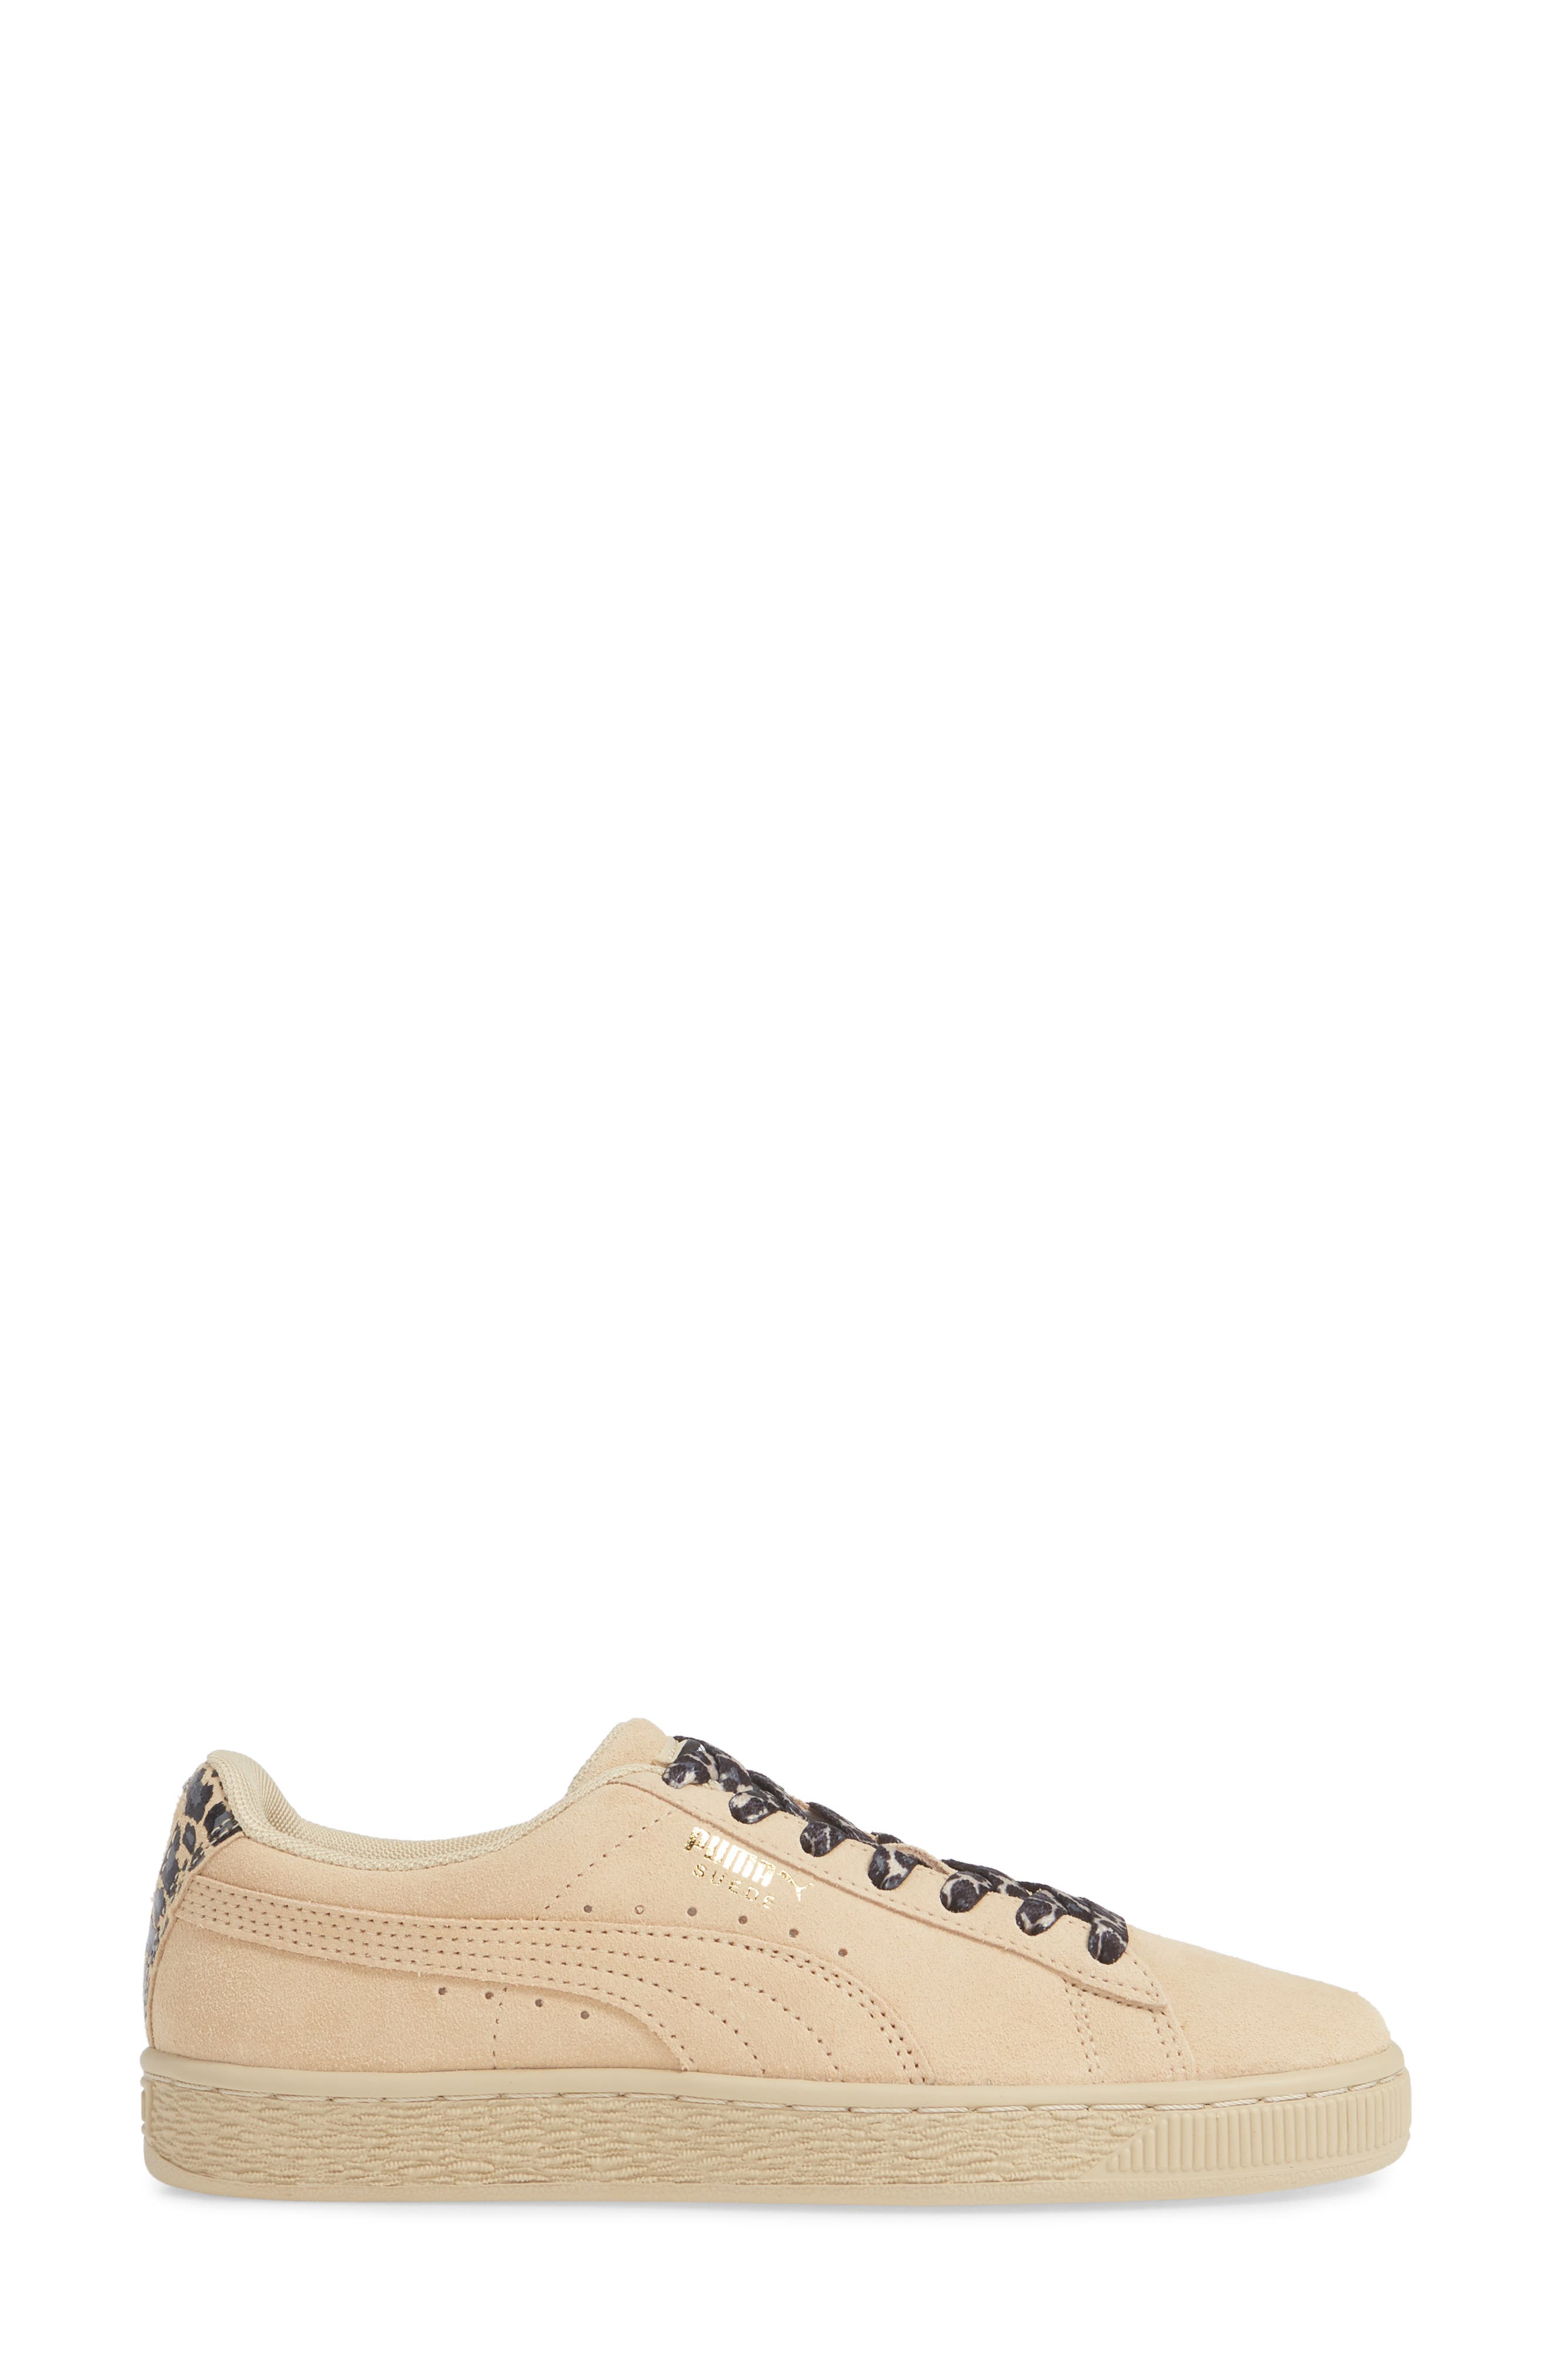 PUMA, Suede Wild Sneaker, Alternate thumbnail 3, color, 280